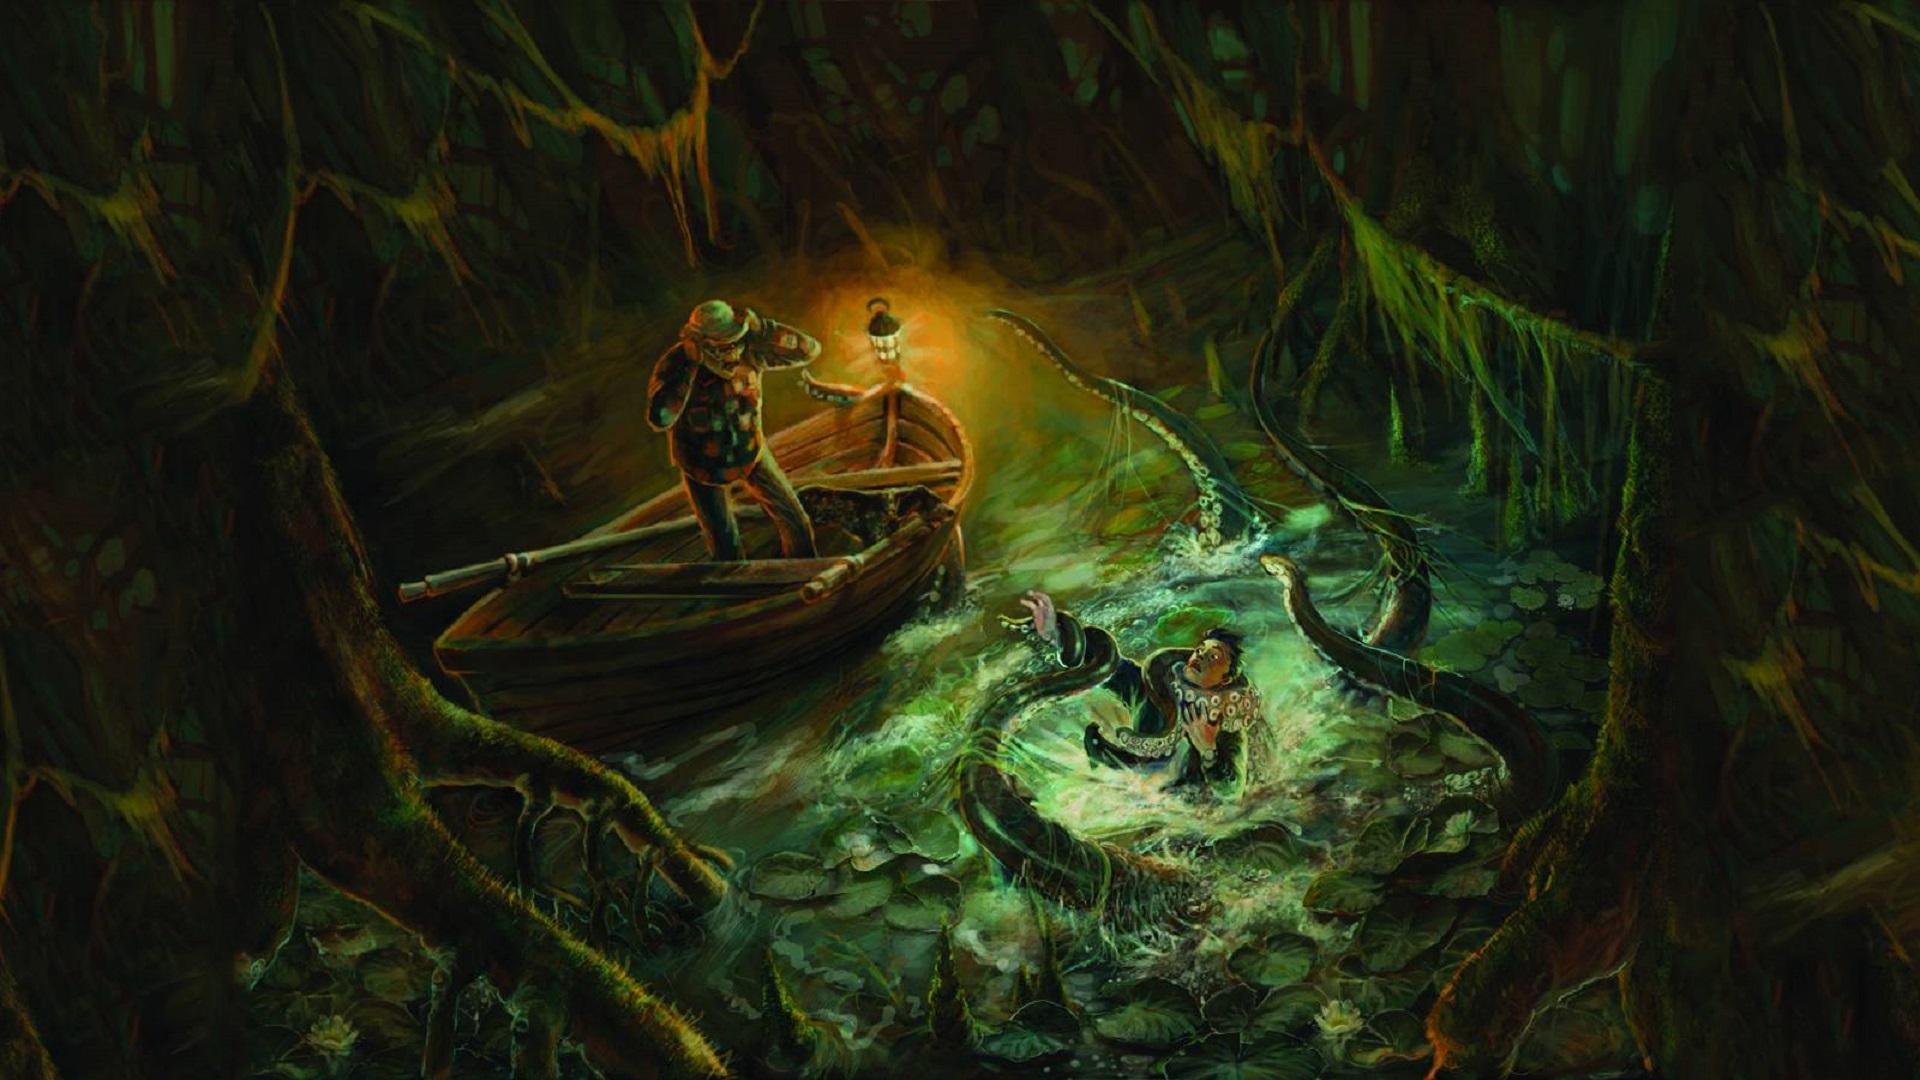 Hp Lovecraft Art Wallpapers: Call Of Cthulhu HD Wallpaper